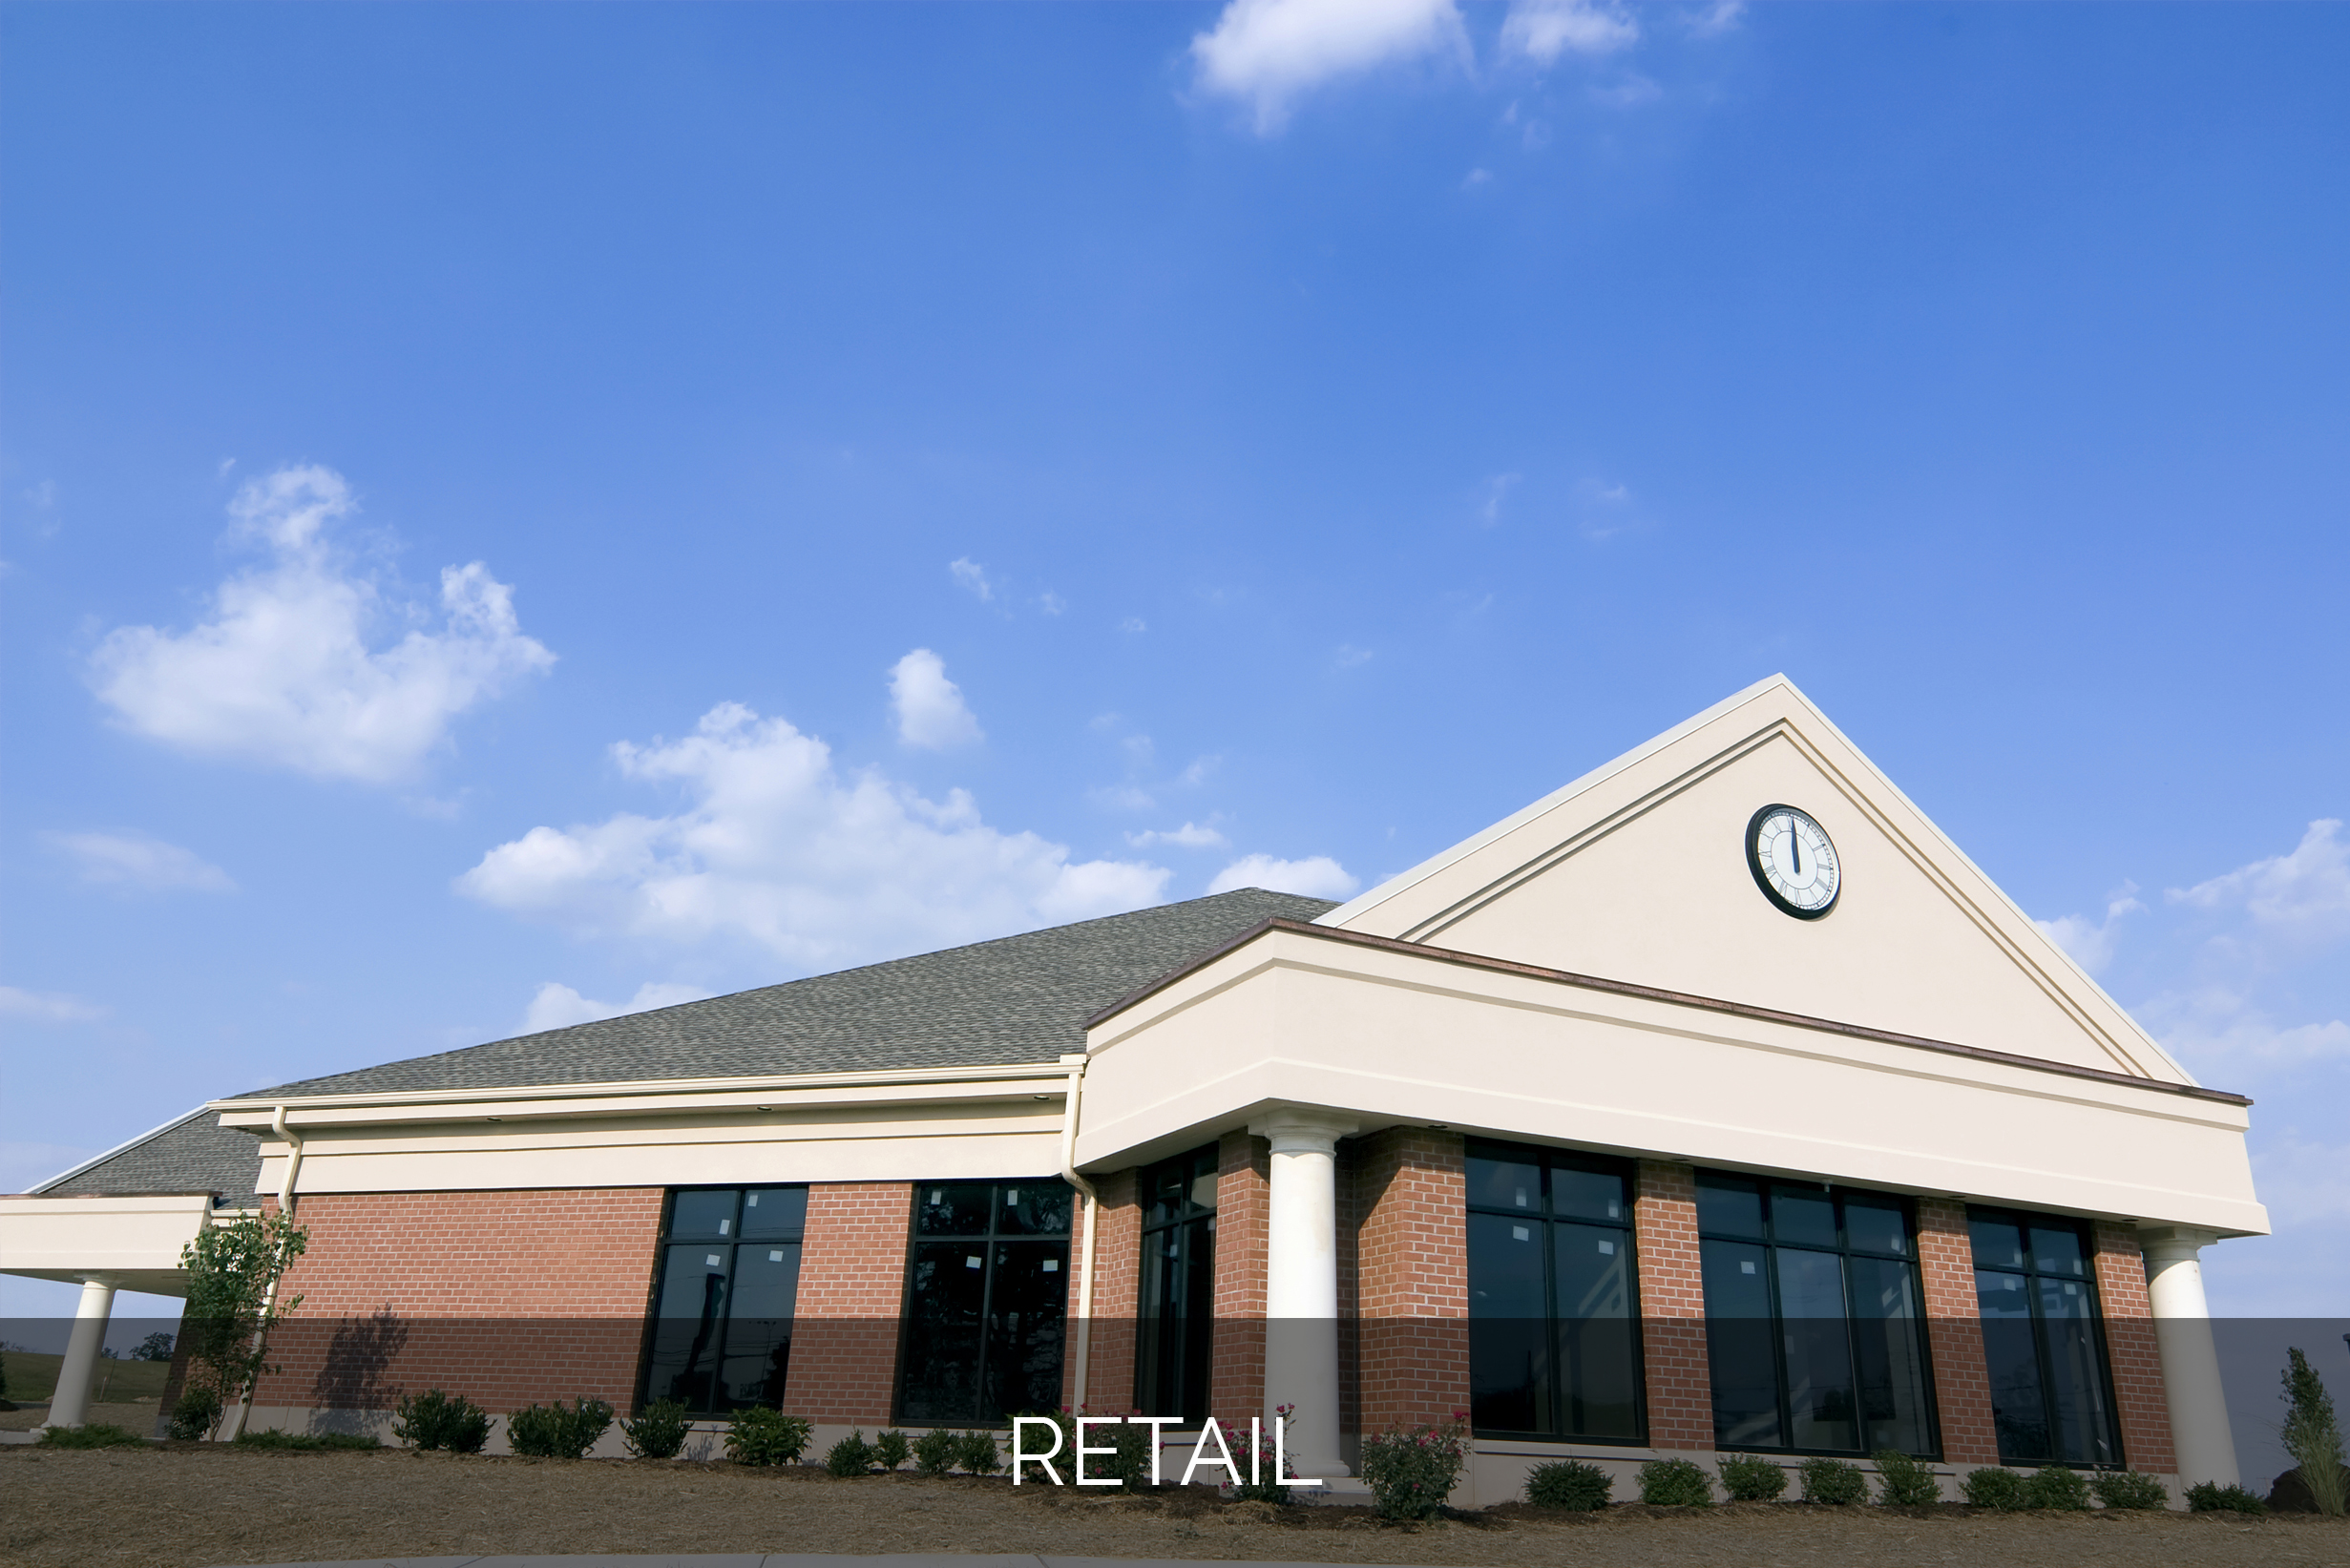 retail-TEXT.jpg